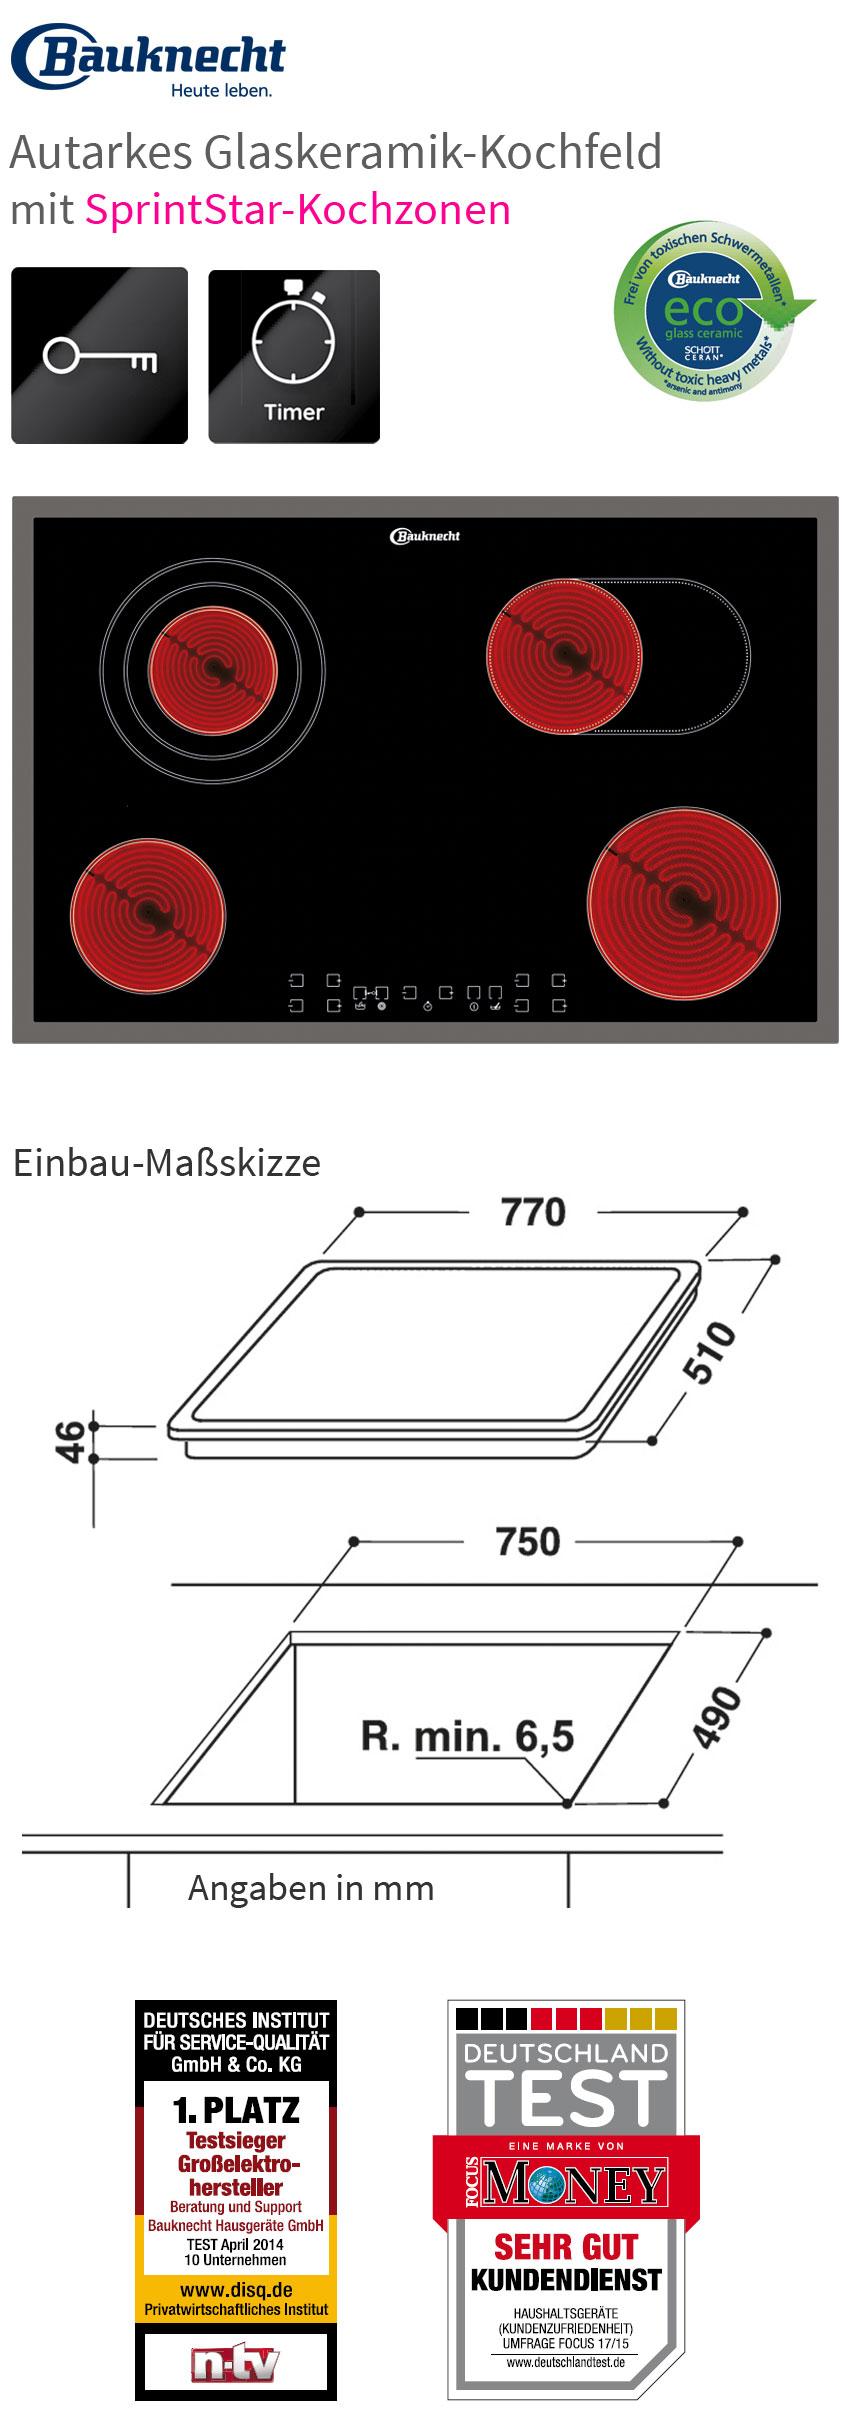 autarke ceranfelder miele km 6115 electric hob was. Black Bedroom Furniture Sets. Home Design Ideas